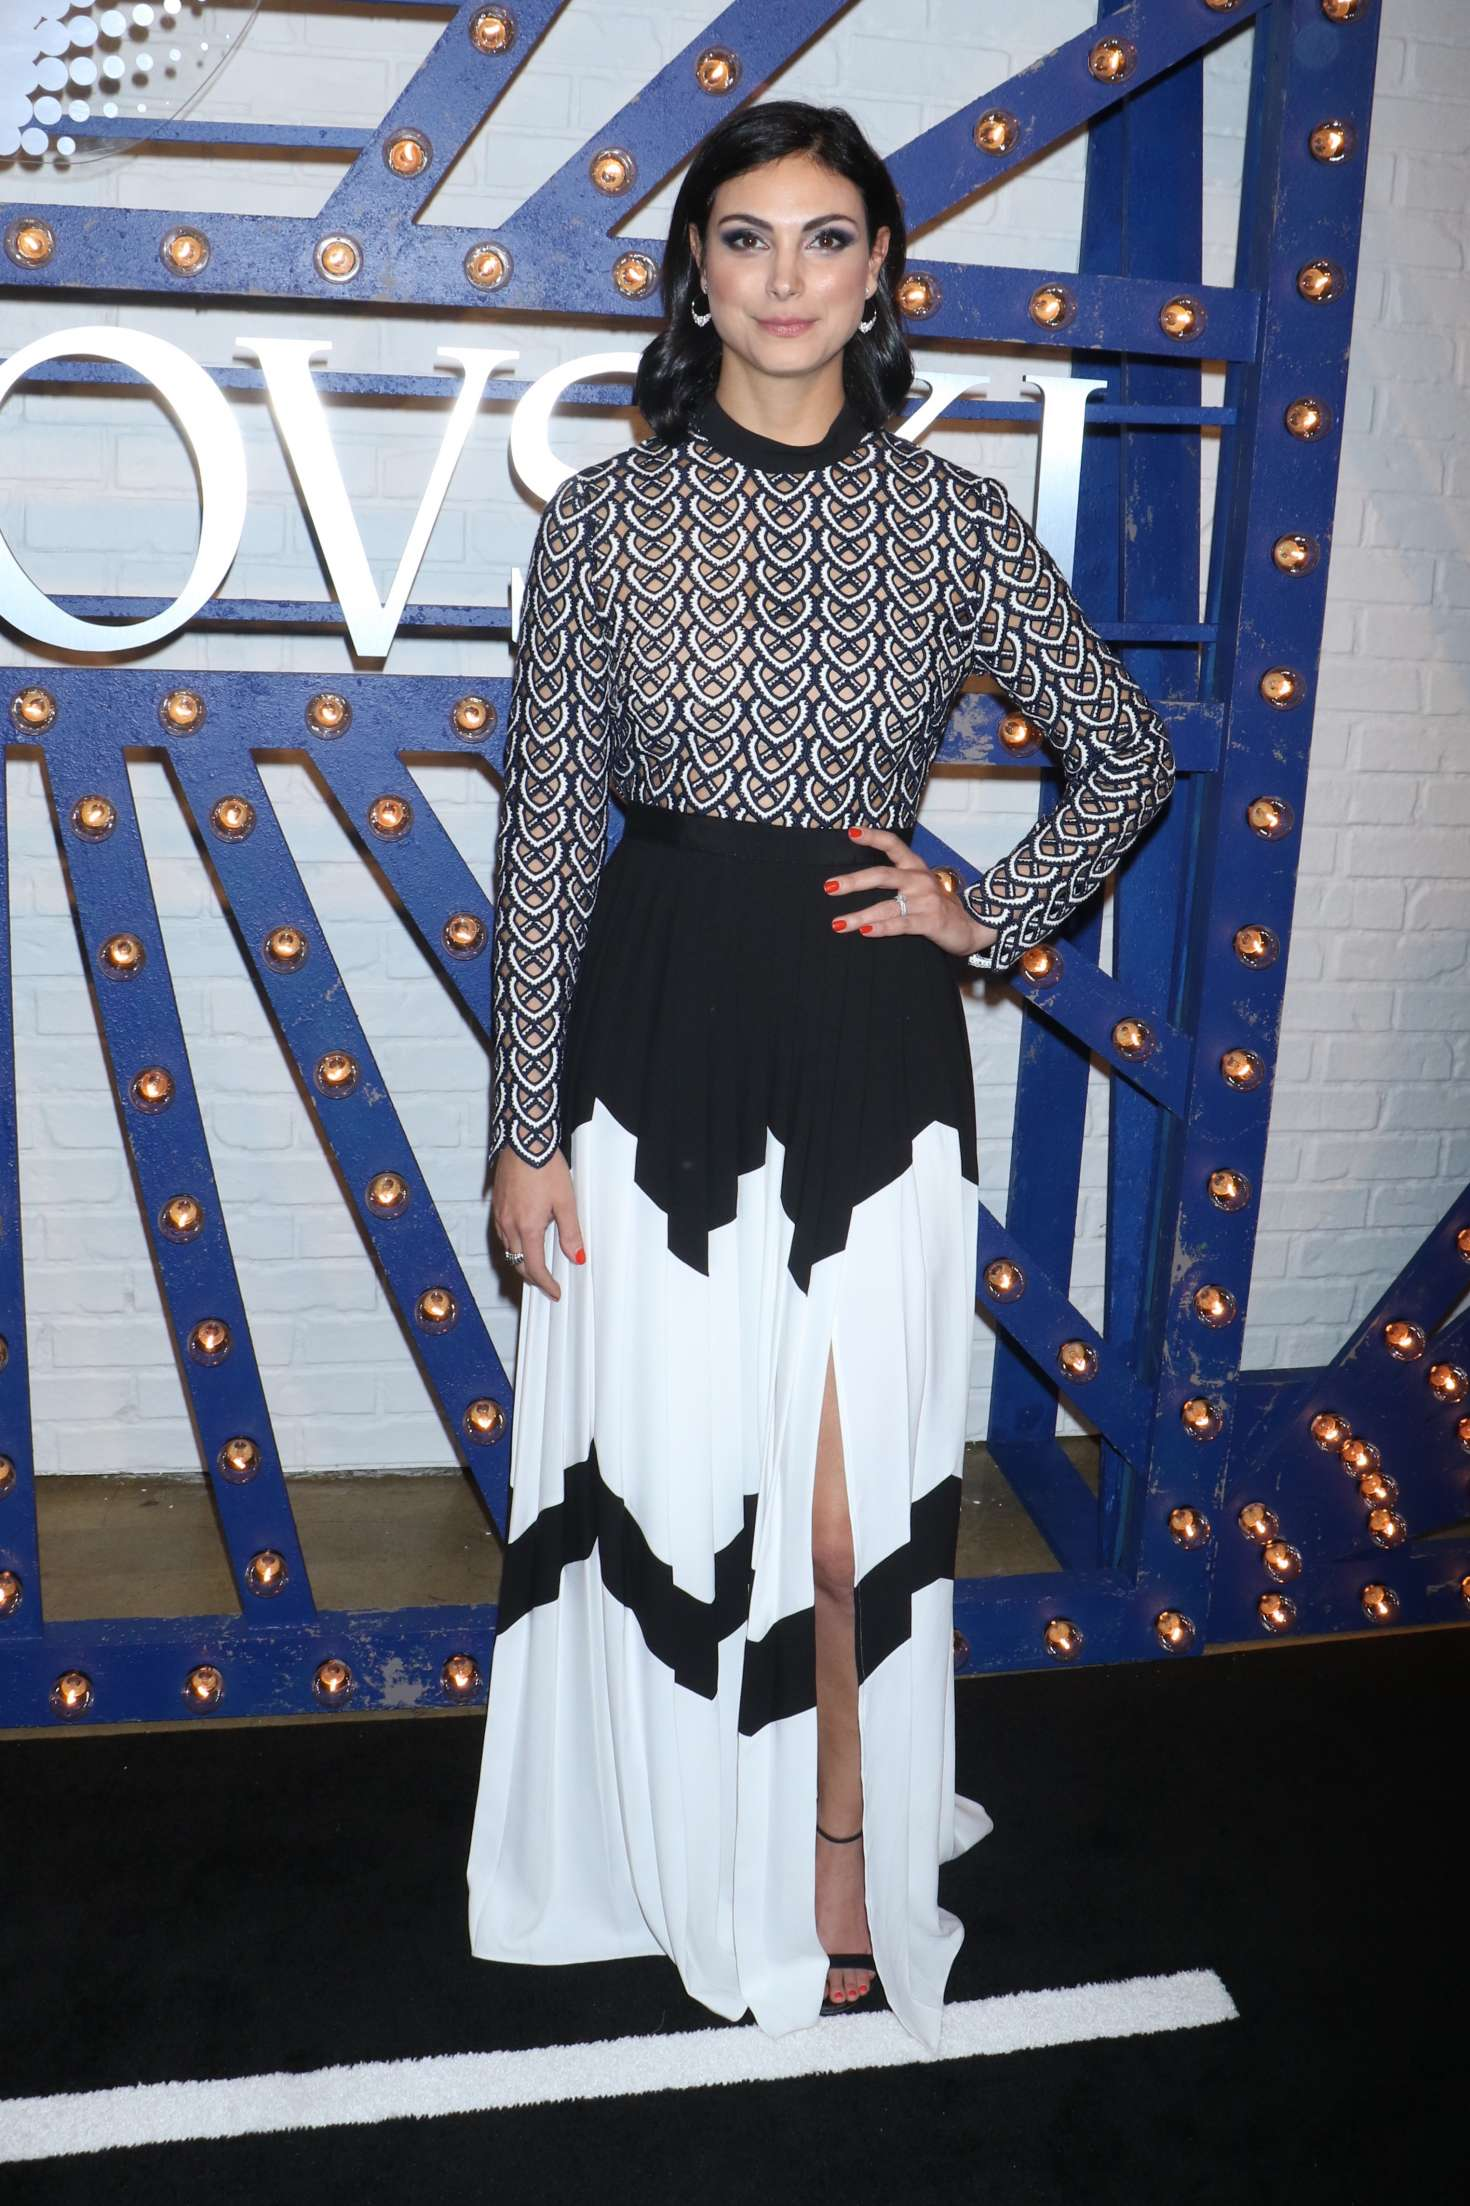 Morena Baccarin 2018 : Morena Baccarin: Swarovski Times Square Store Party -13